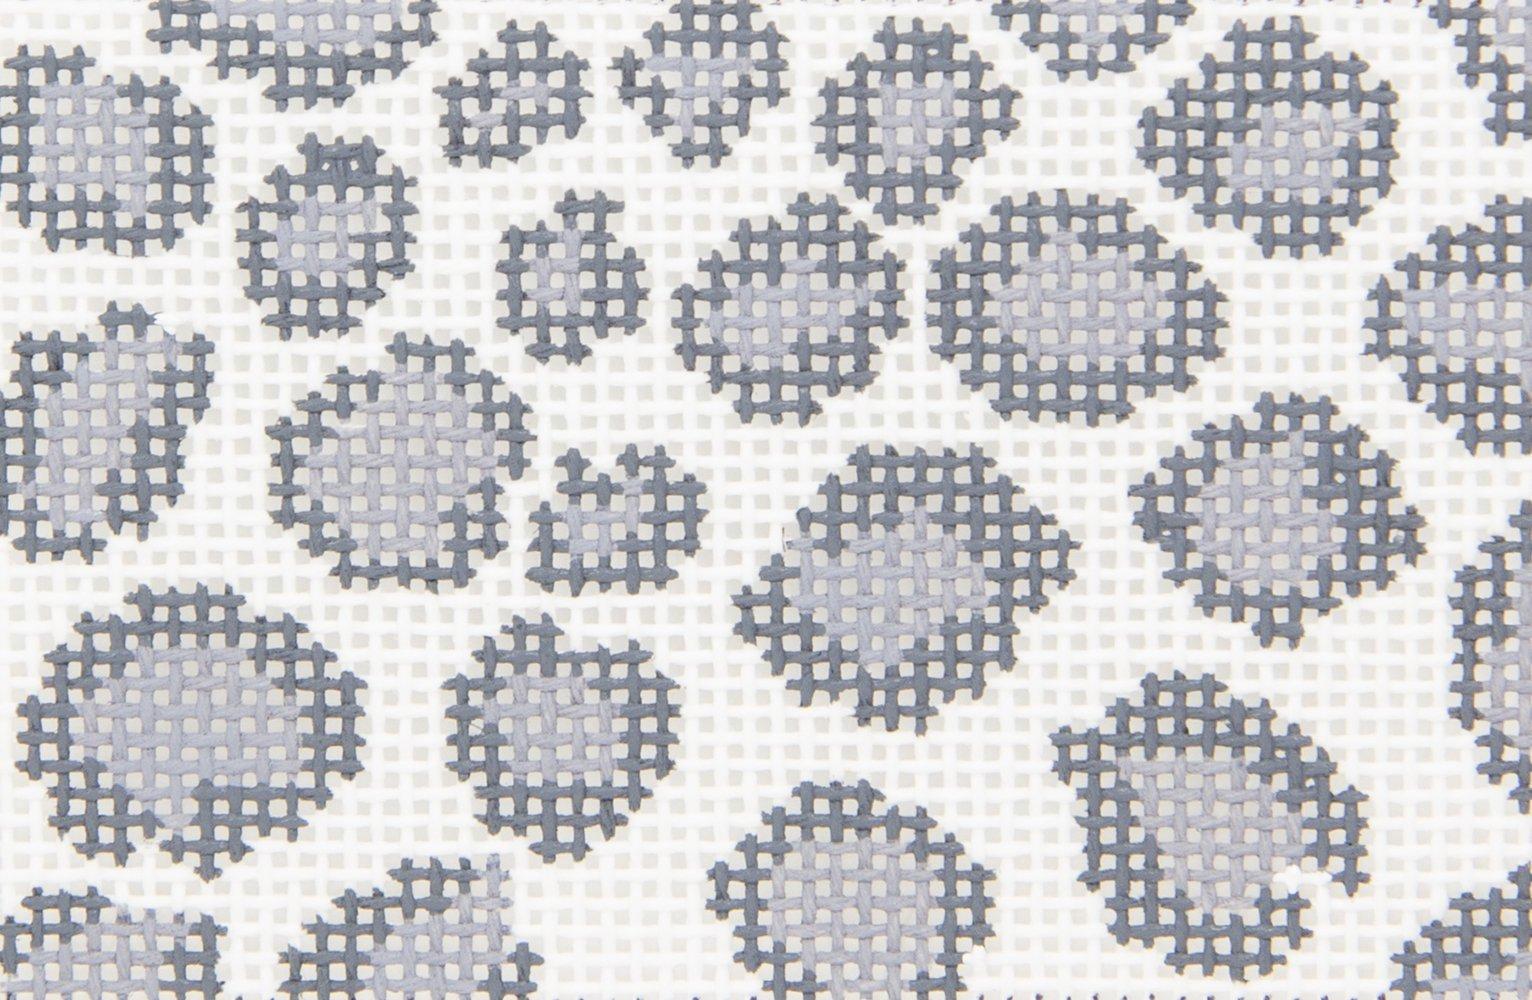 SR7995 Leopard Spots Gray Insert Susan Roberts Needlepoint